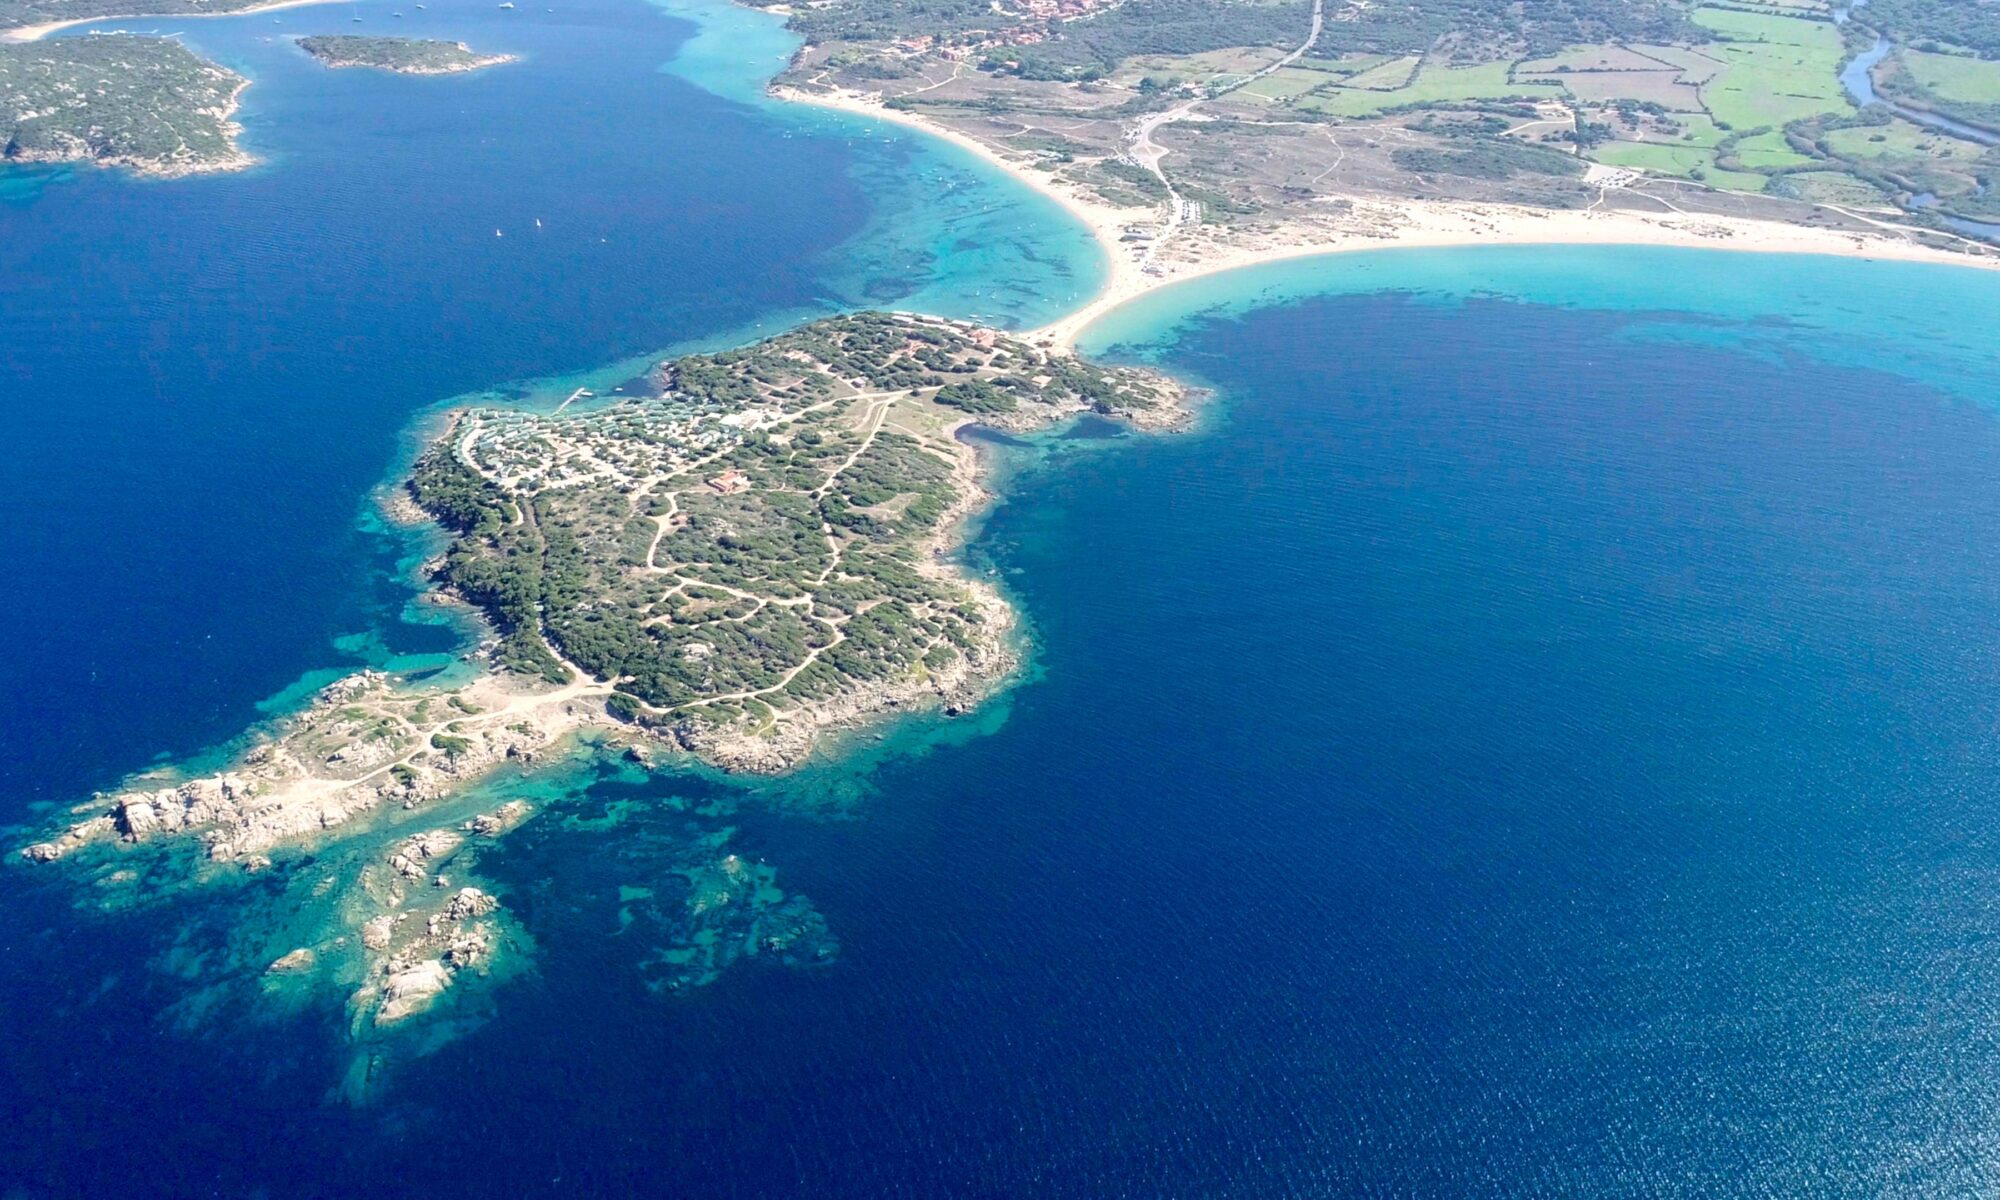 Kite a POrto Pollo in Sardegna